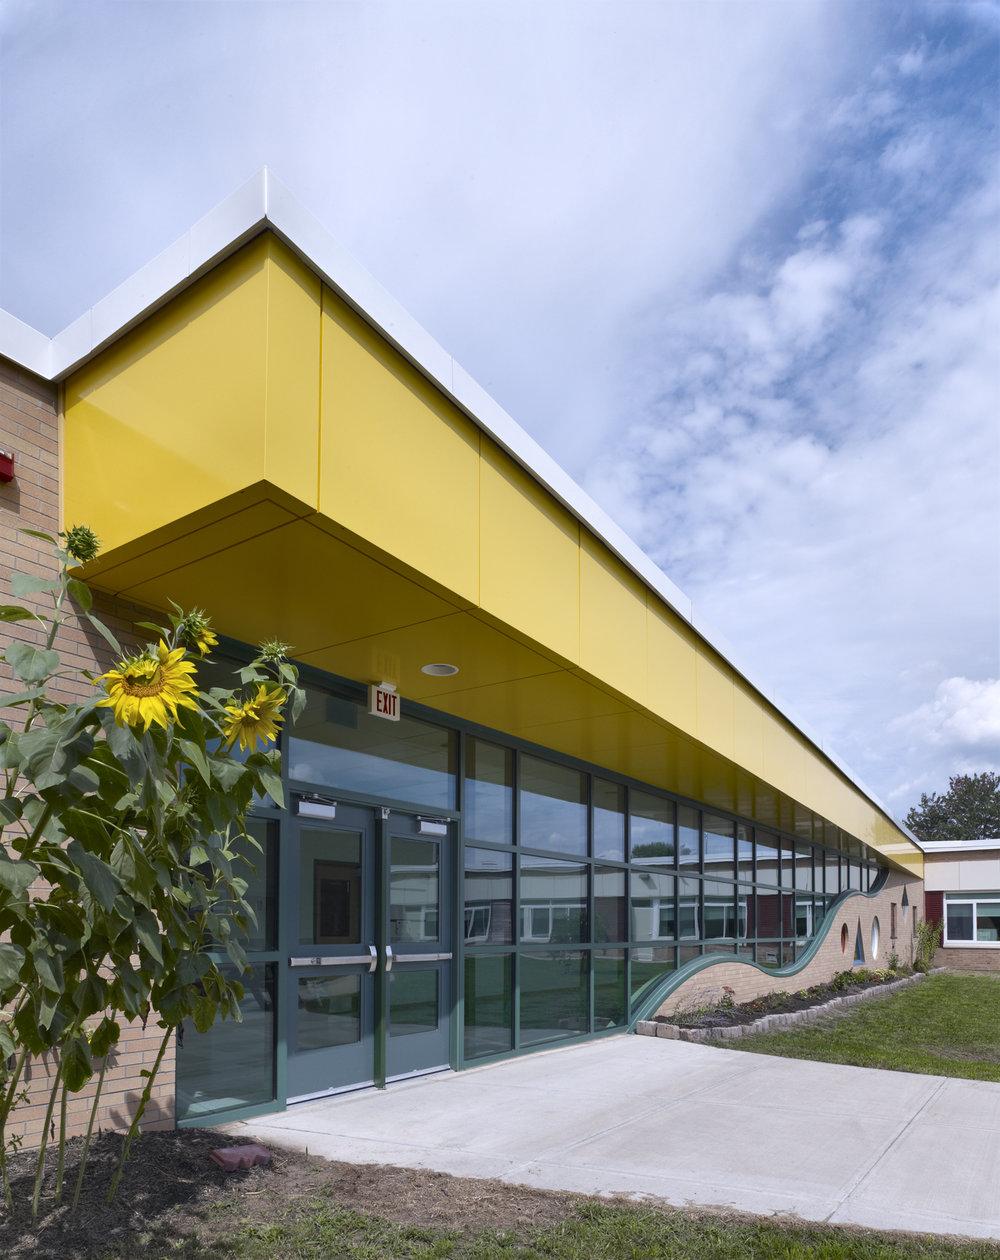 Niskayuna Central School District